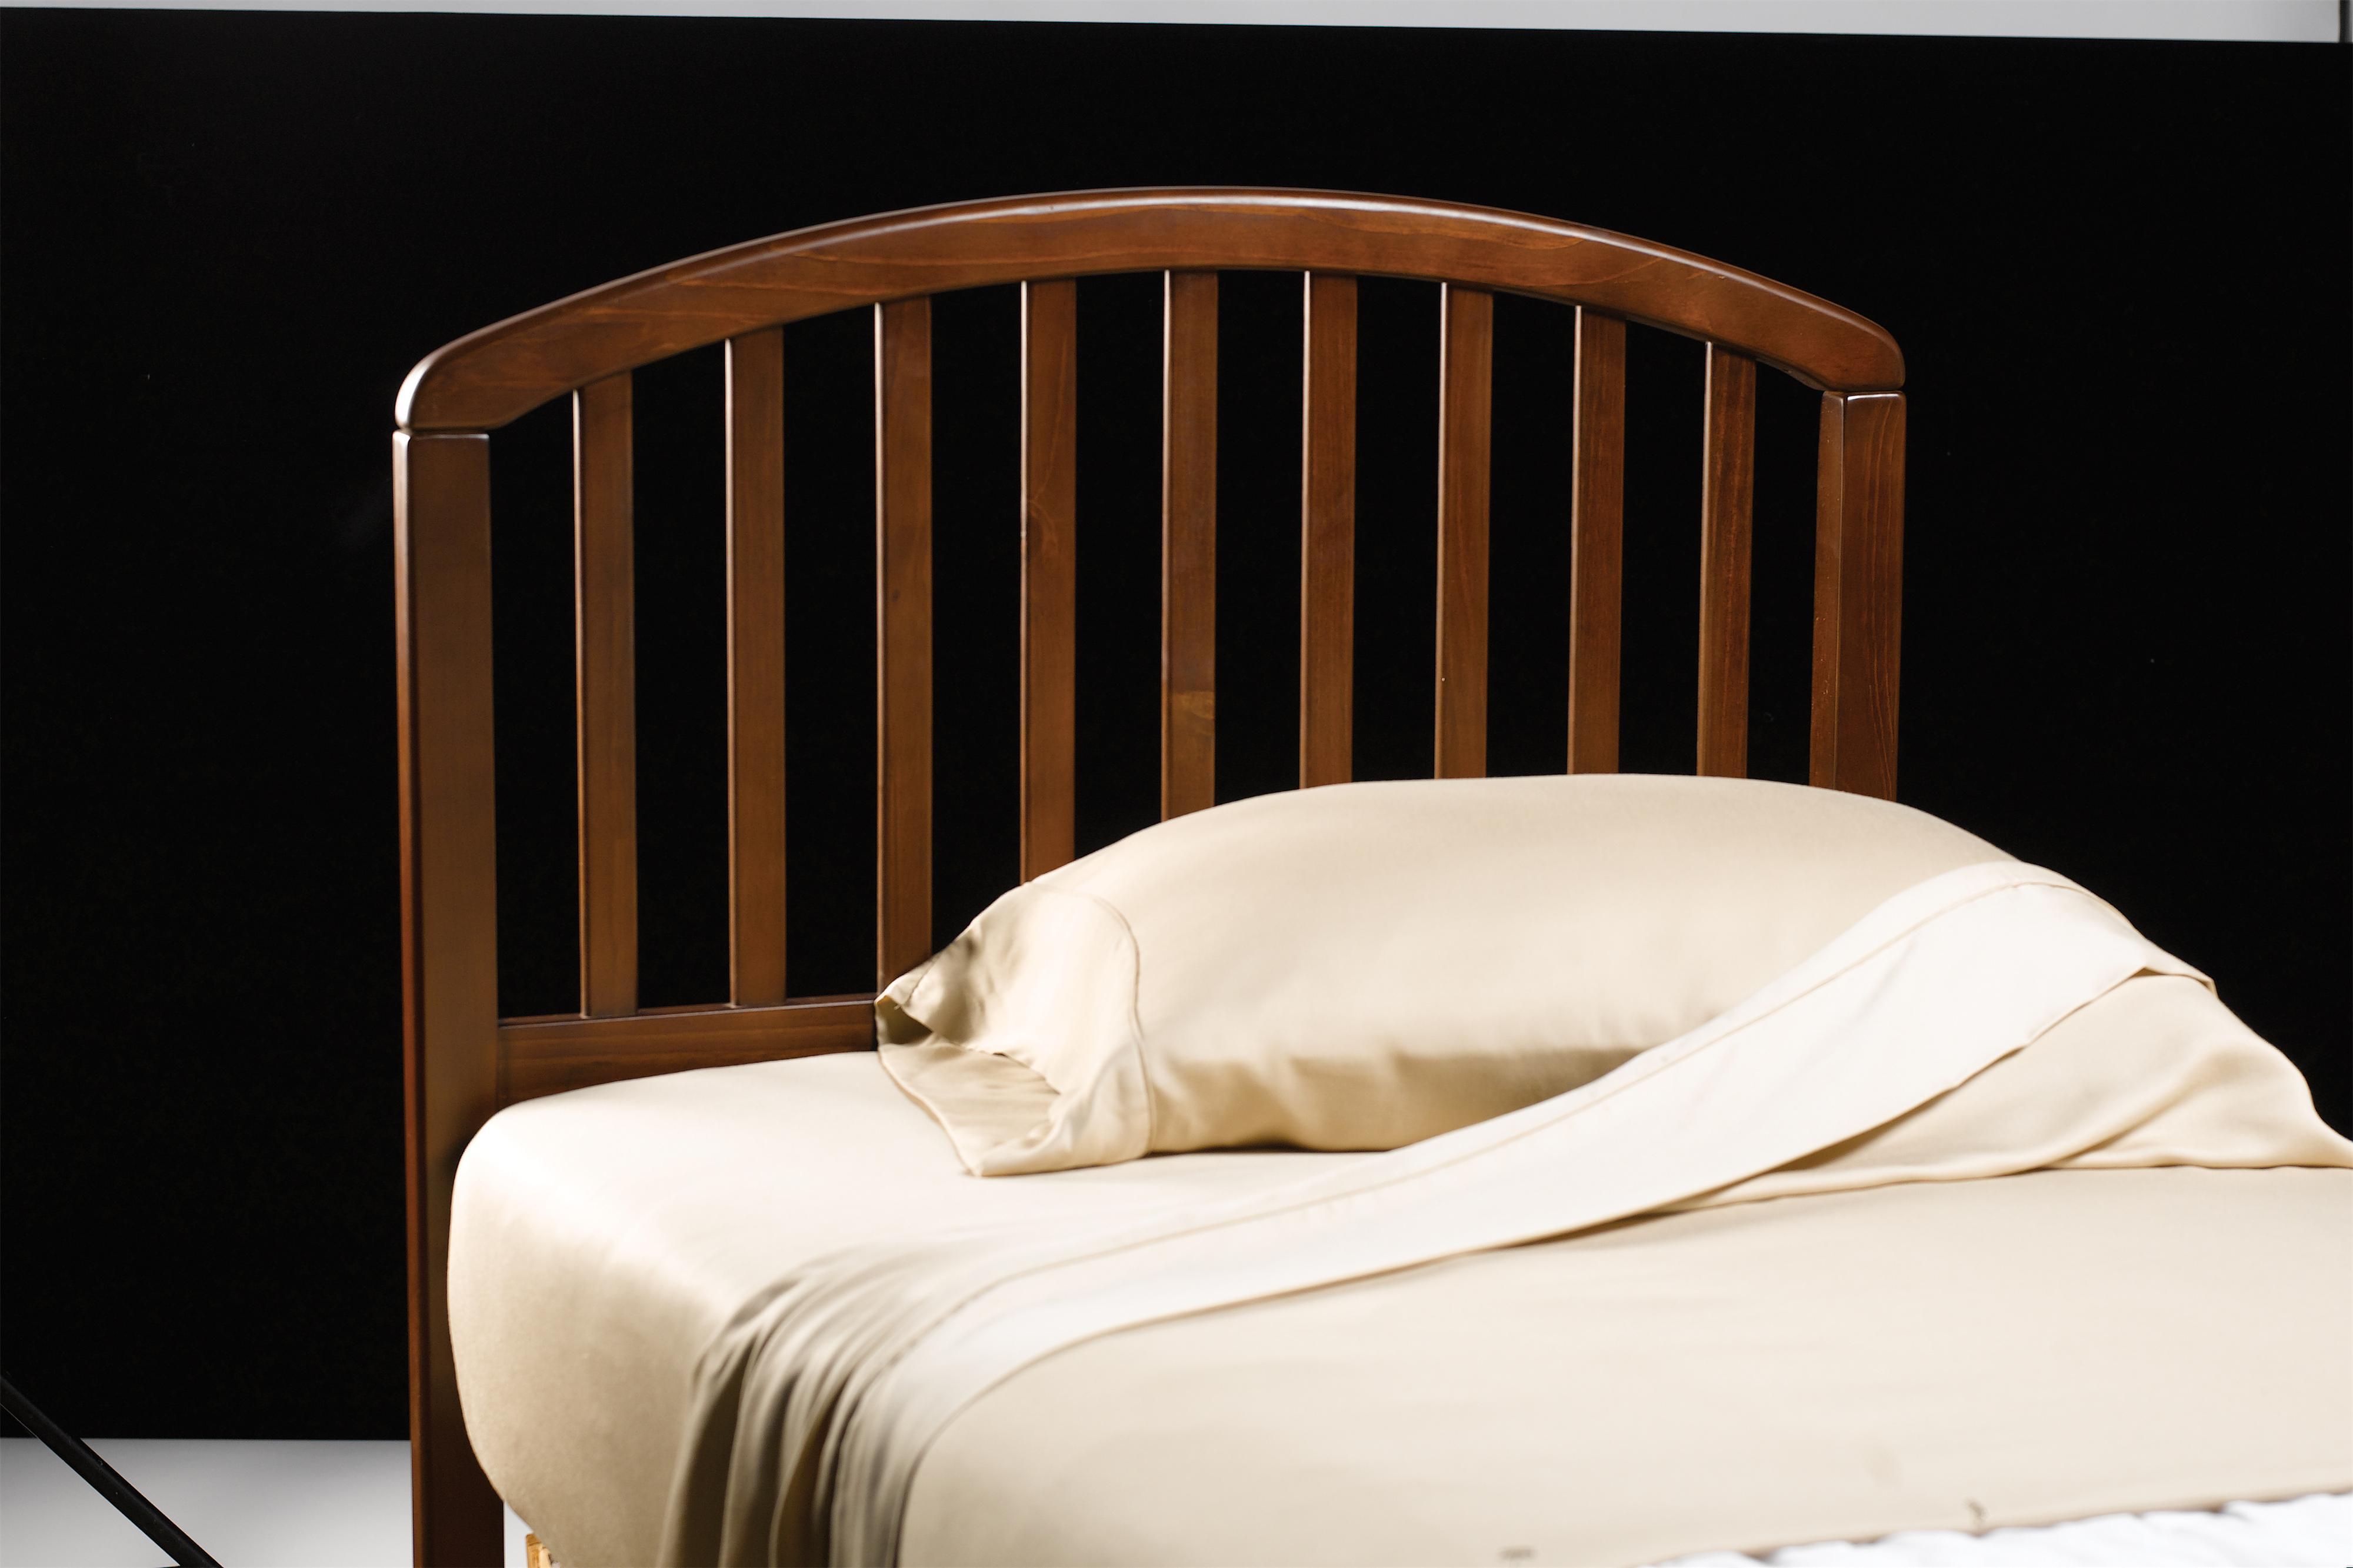 Wood Beds Twin Carolina Headboard by Hillsdale at Crowley Furniture & Mattress